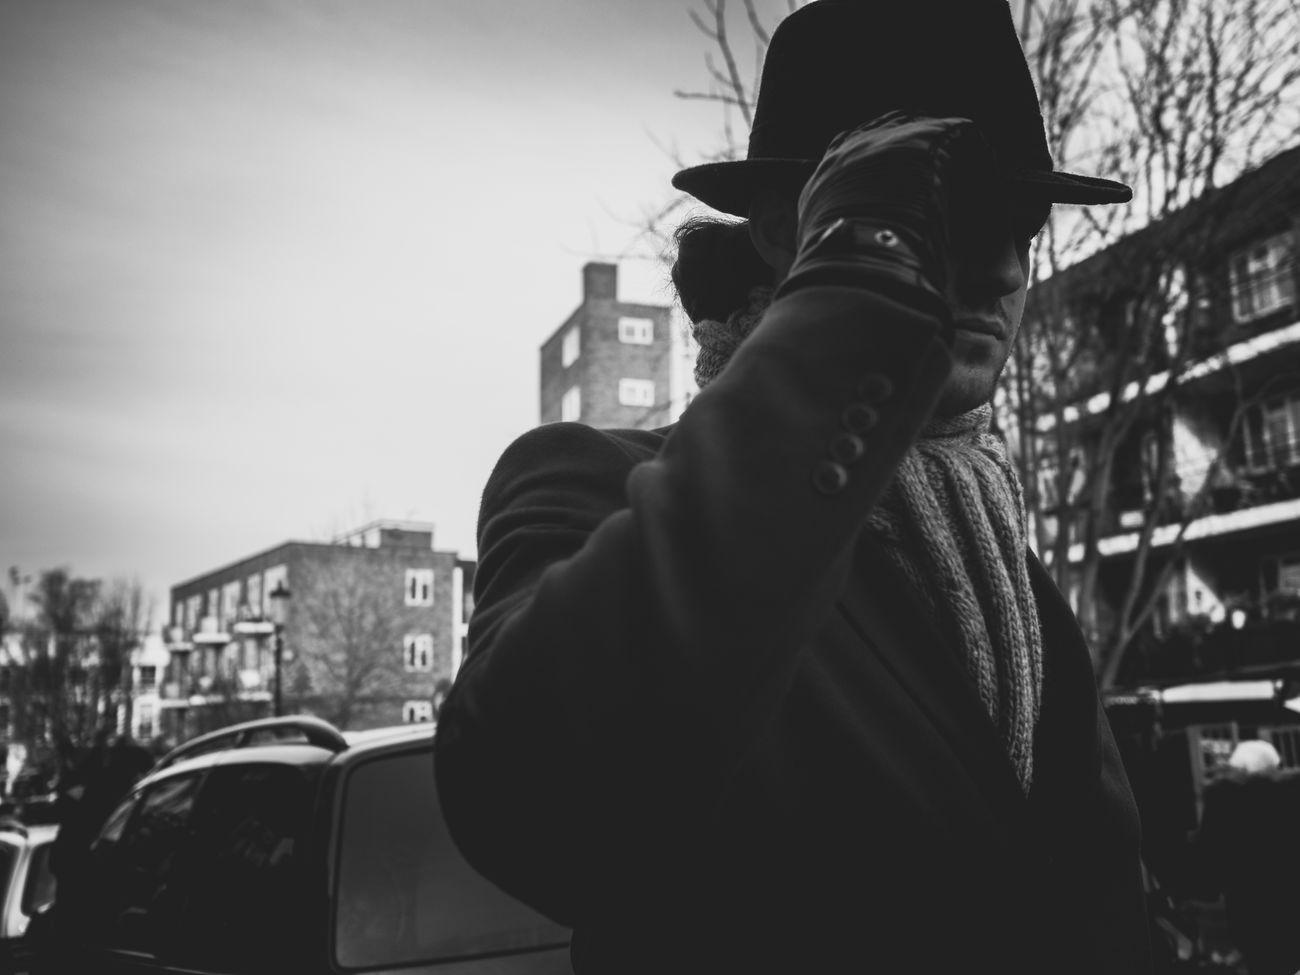 Portobello Gentlemen Street Streetphotography People London Lifestyle Candid City Maxgor.com Black And White Street Photography Portrait City Life Prime Lens Monochrome Photography 35mm Lifestyles Olympus Pen-f London Maxgor Street Portraiture Cıty Black And White Photography Streetlife Rawstreets Stranger Portobello Market